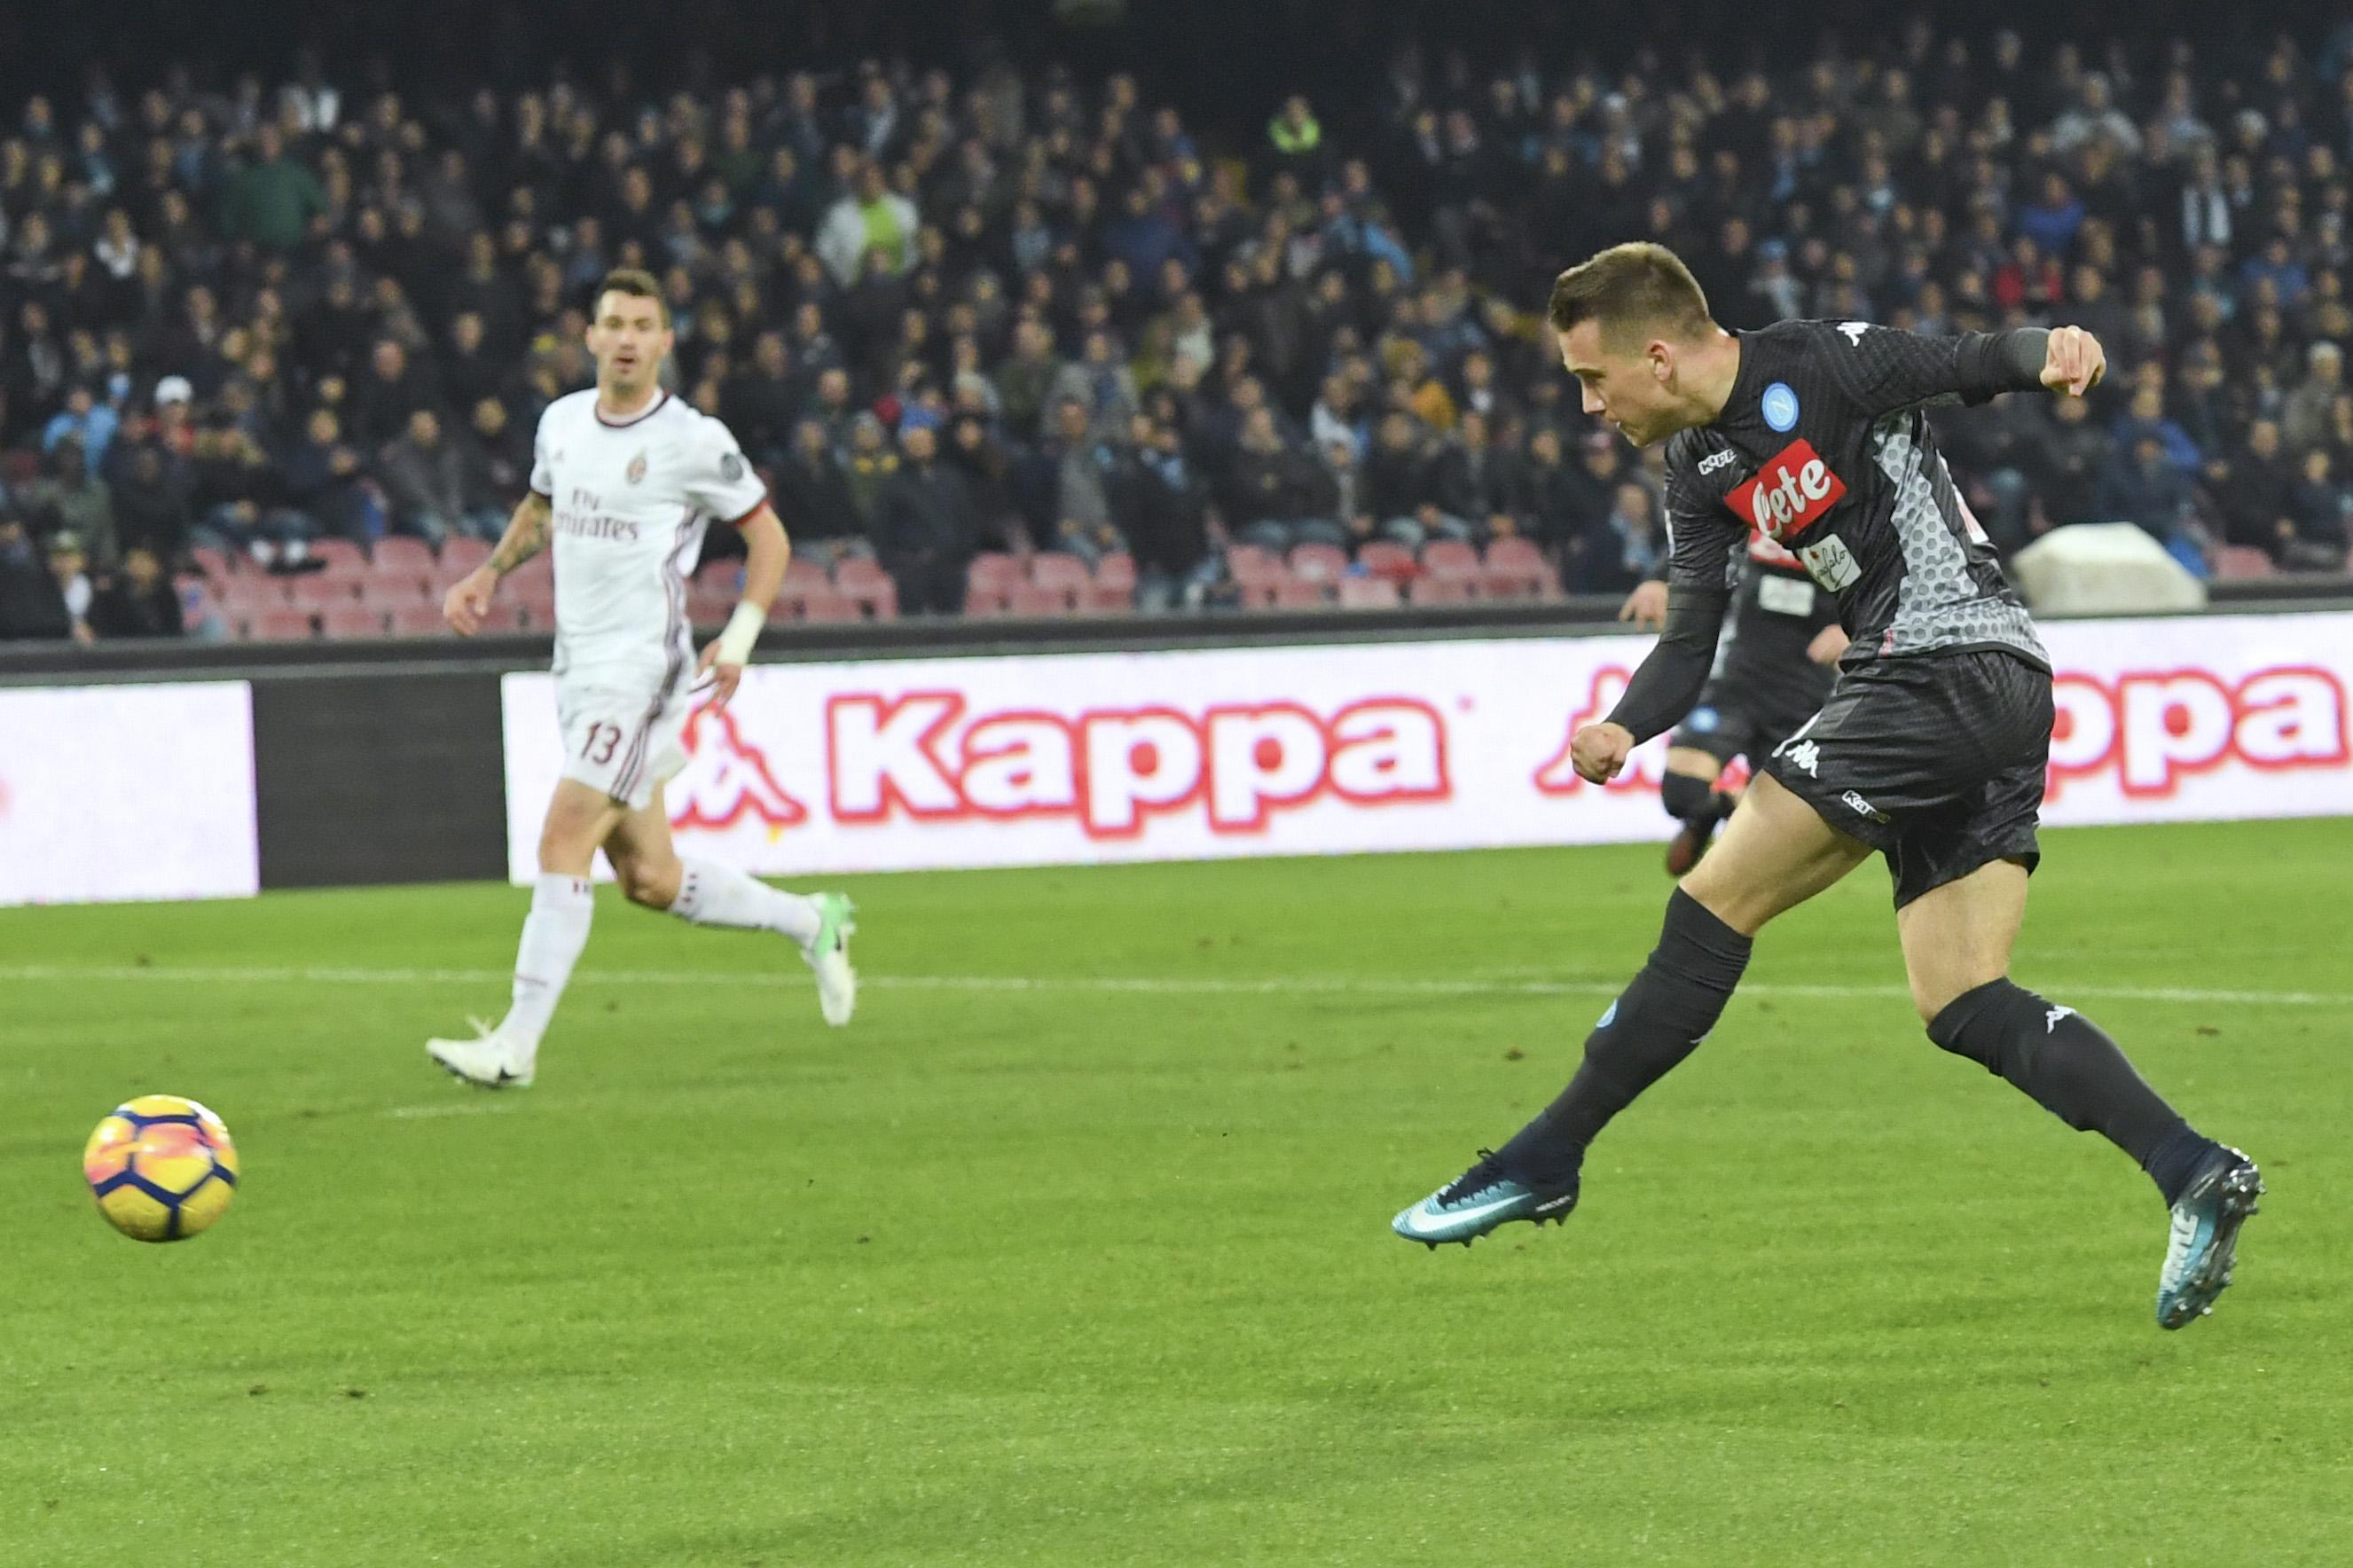 Serie A: Napoli-Milan 2-1